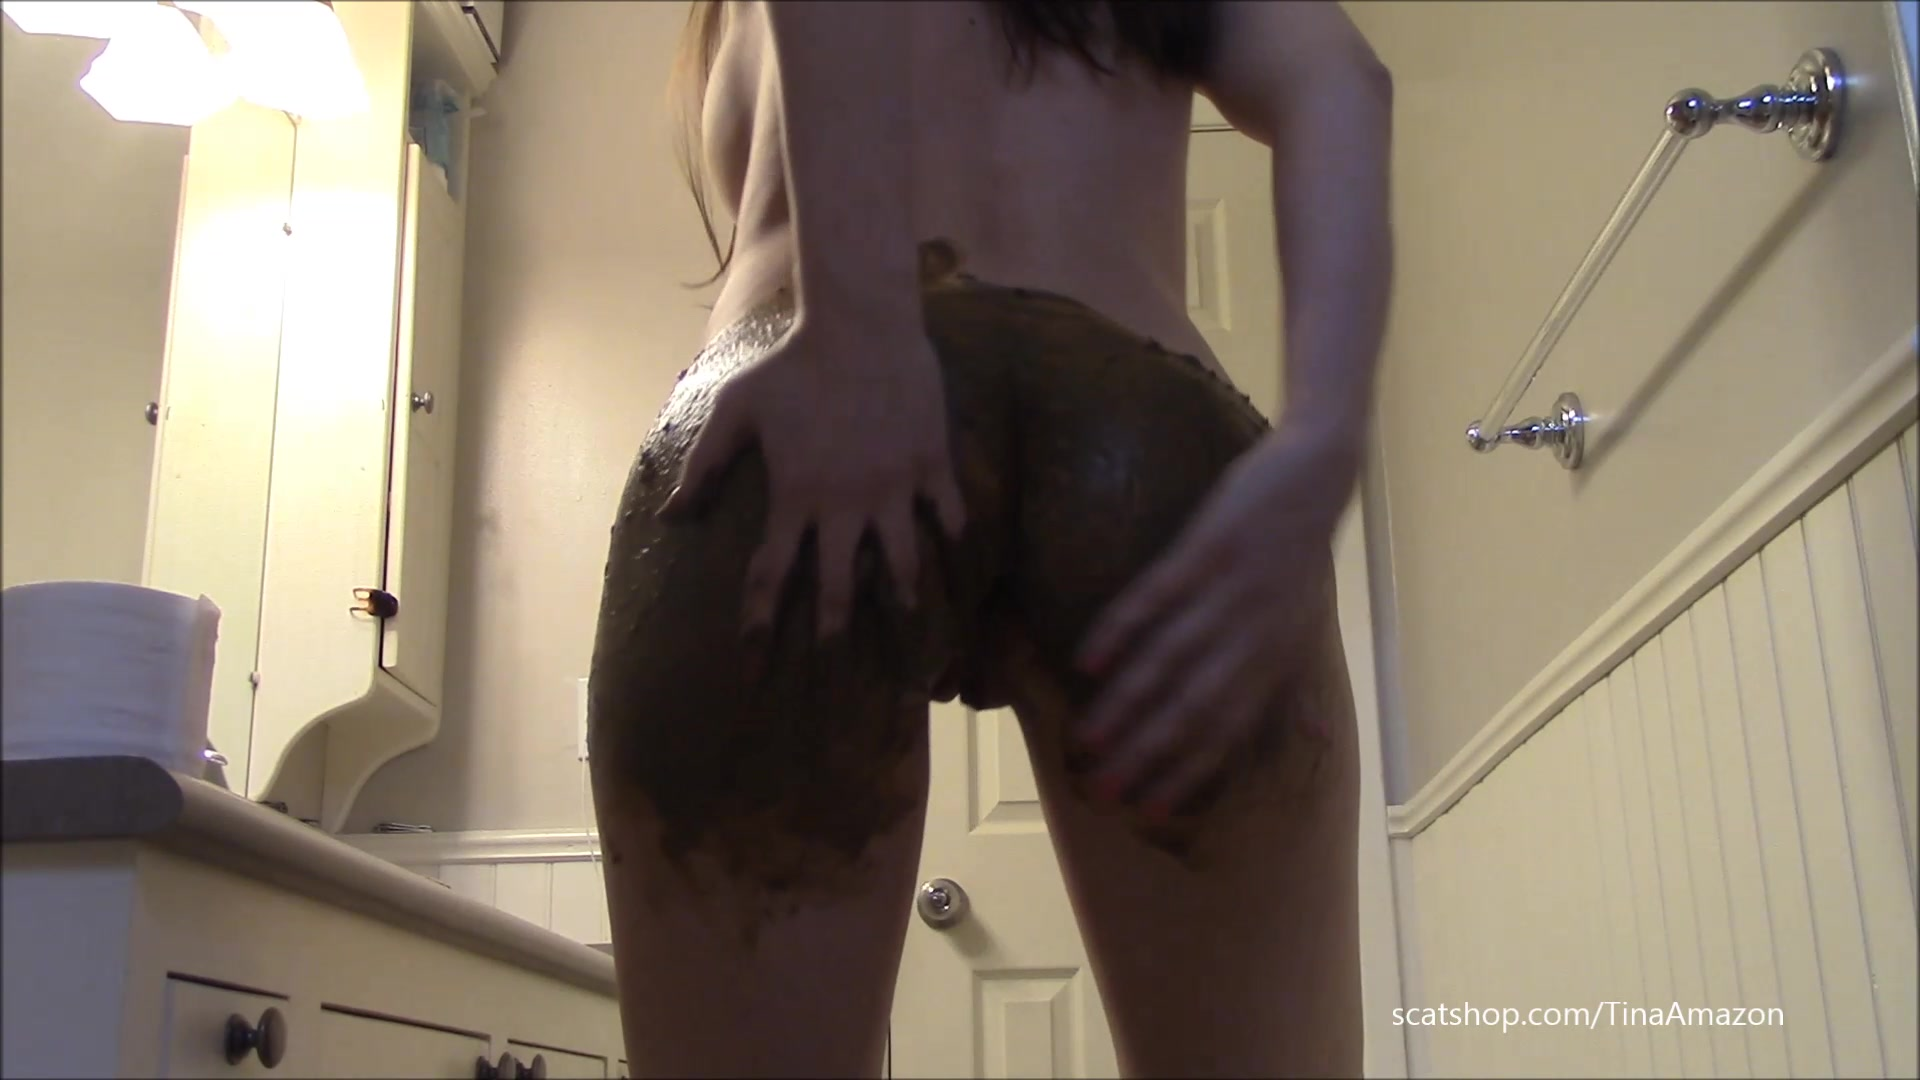 TinaAmazon_-_Naughty_Nun_Shit_Smear_and_Swallow.00001.jpg